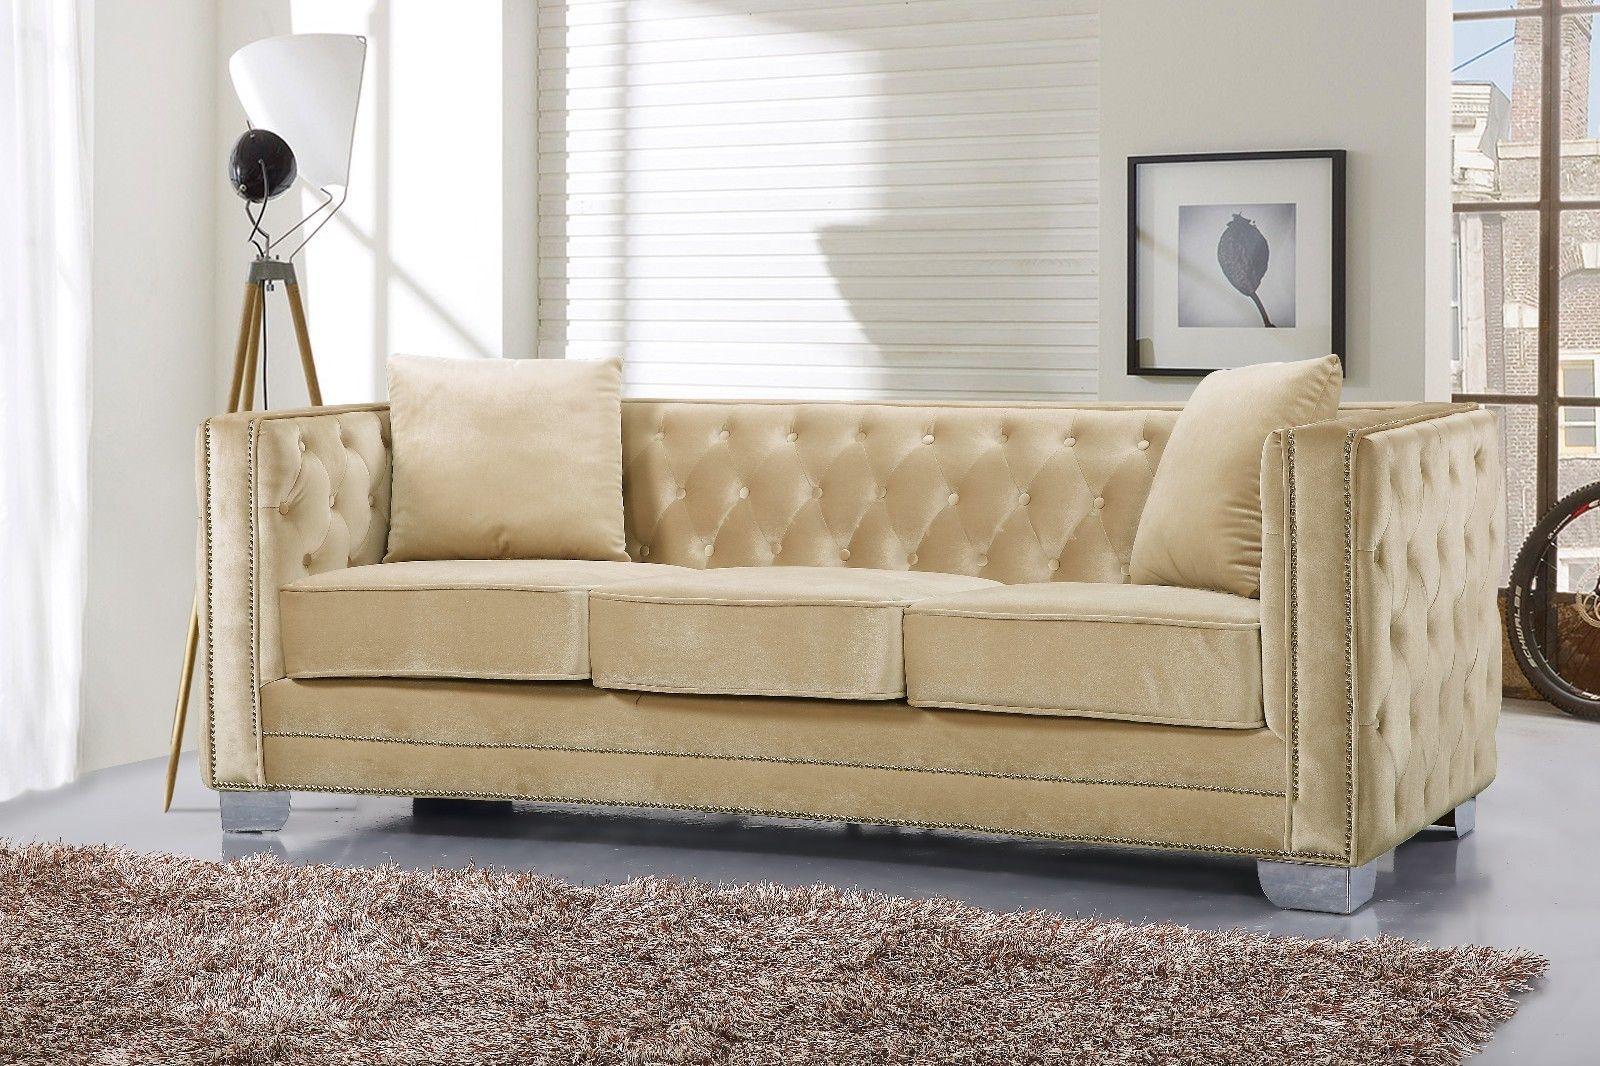 Meridian 648 Velvet Living Room Sofa Set 2pc. Tufted Beige Contemporary Style